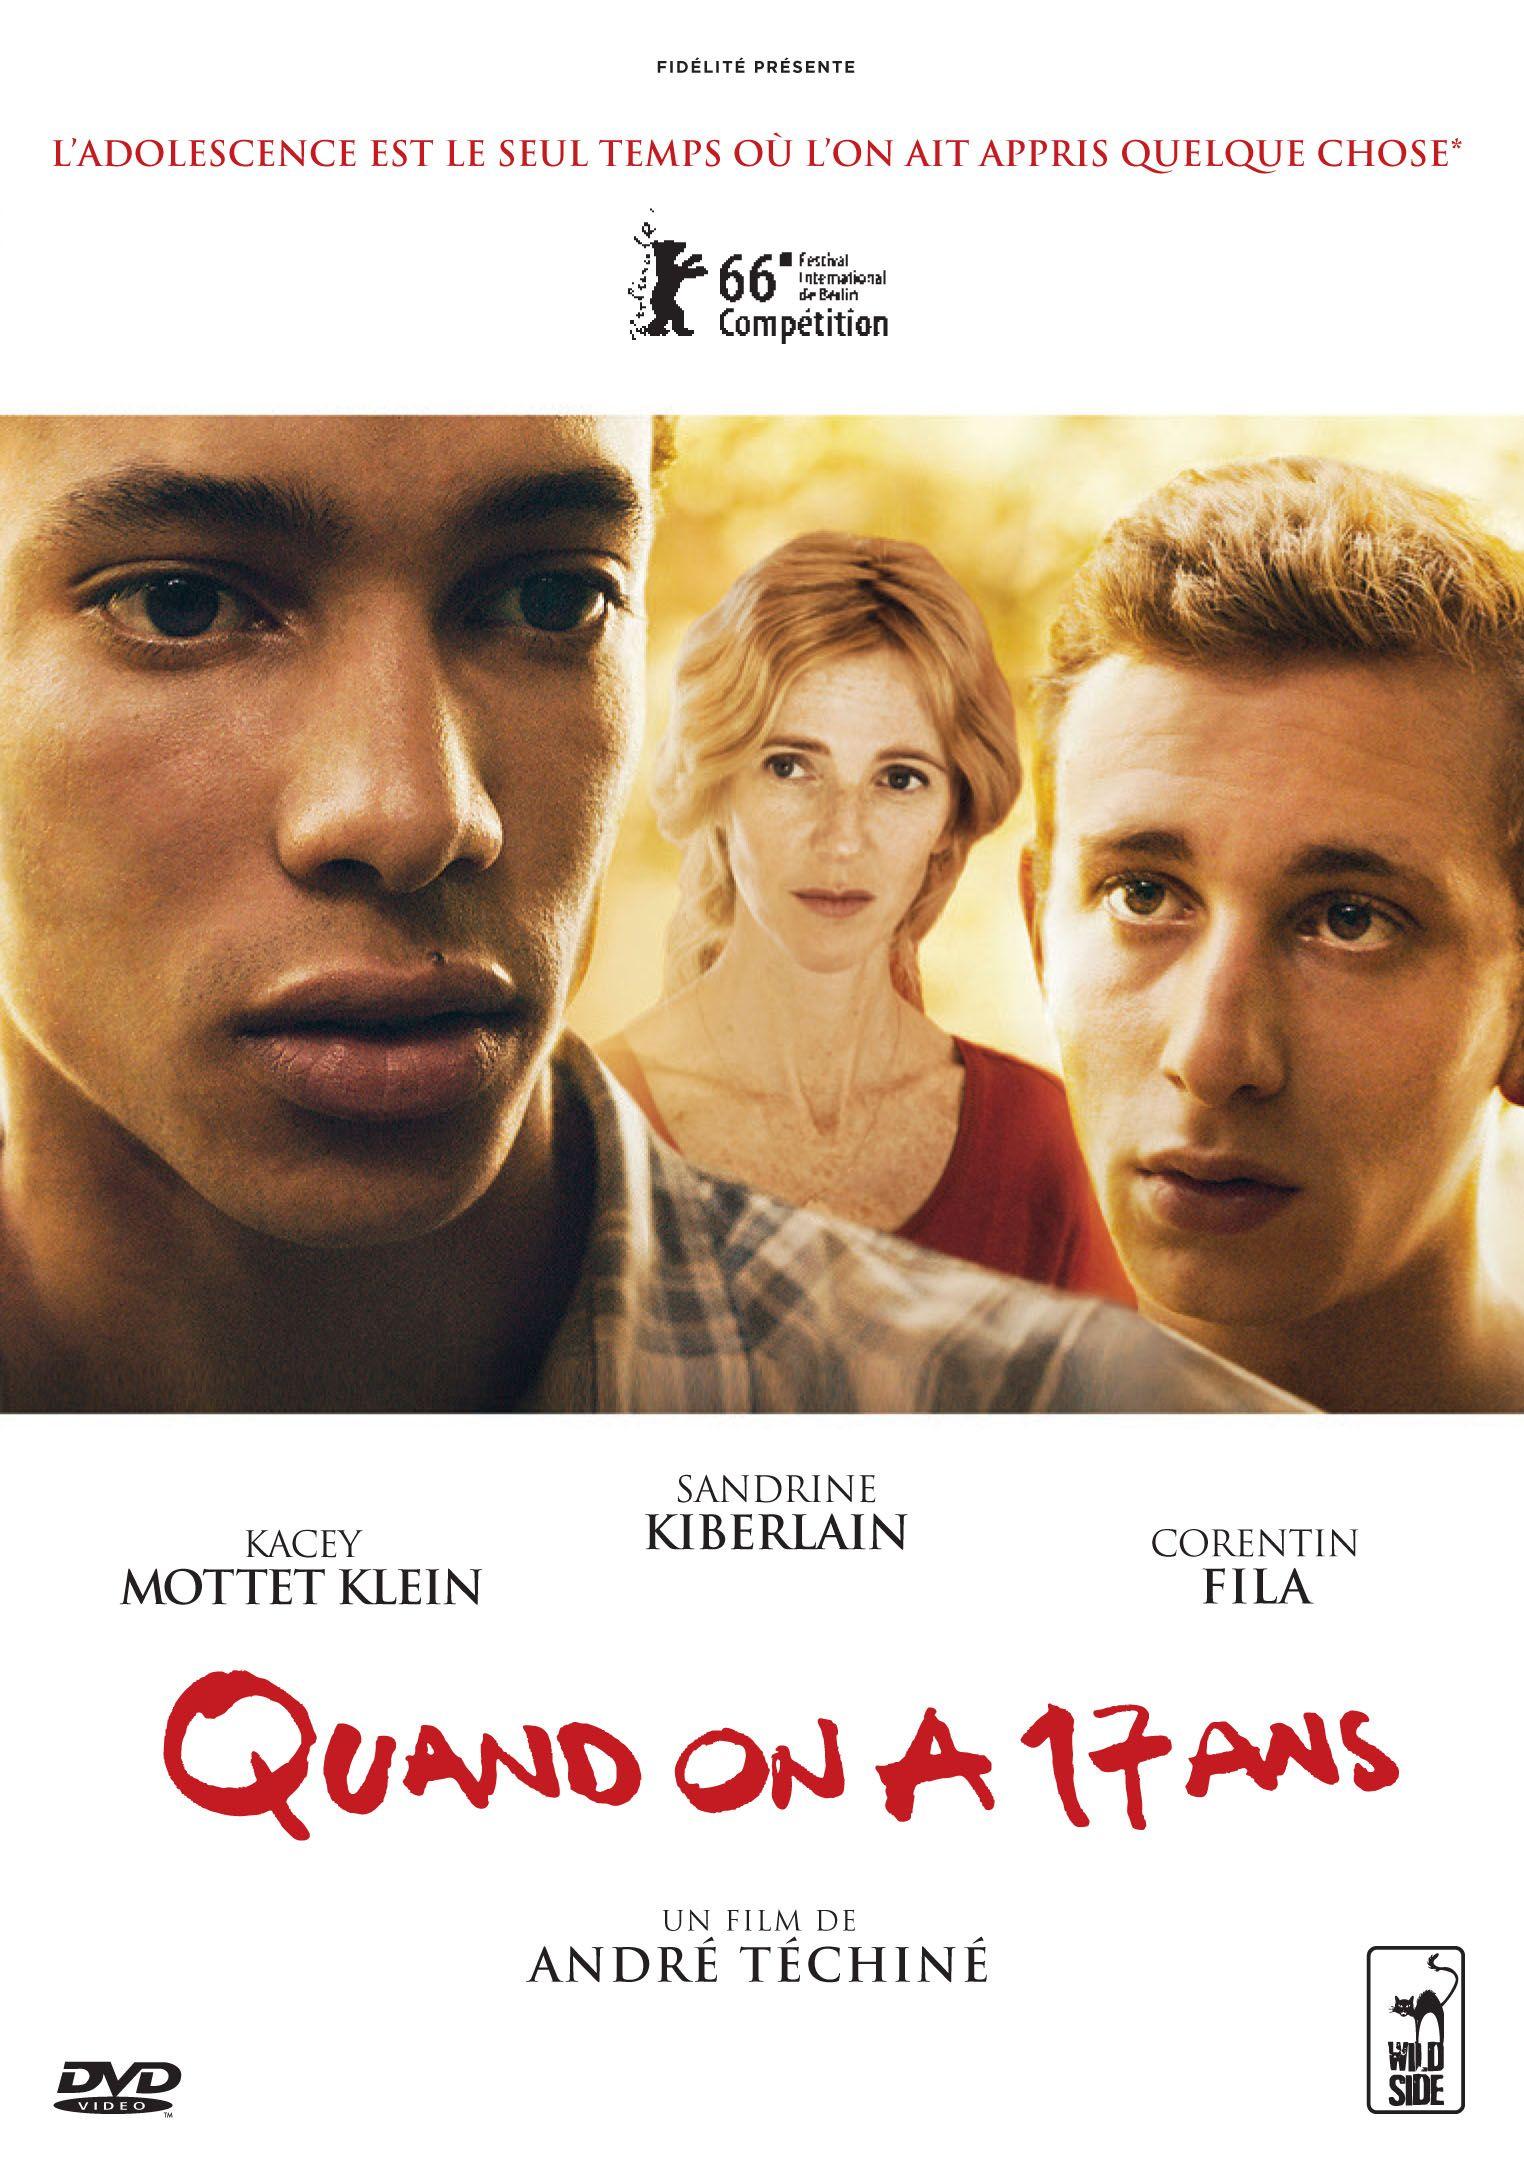 Epingle Sur Filmes 2017 Movies 2017